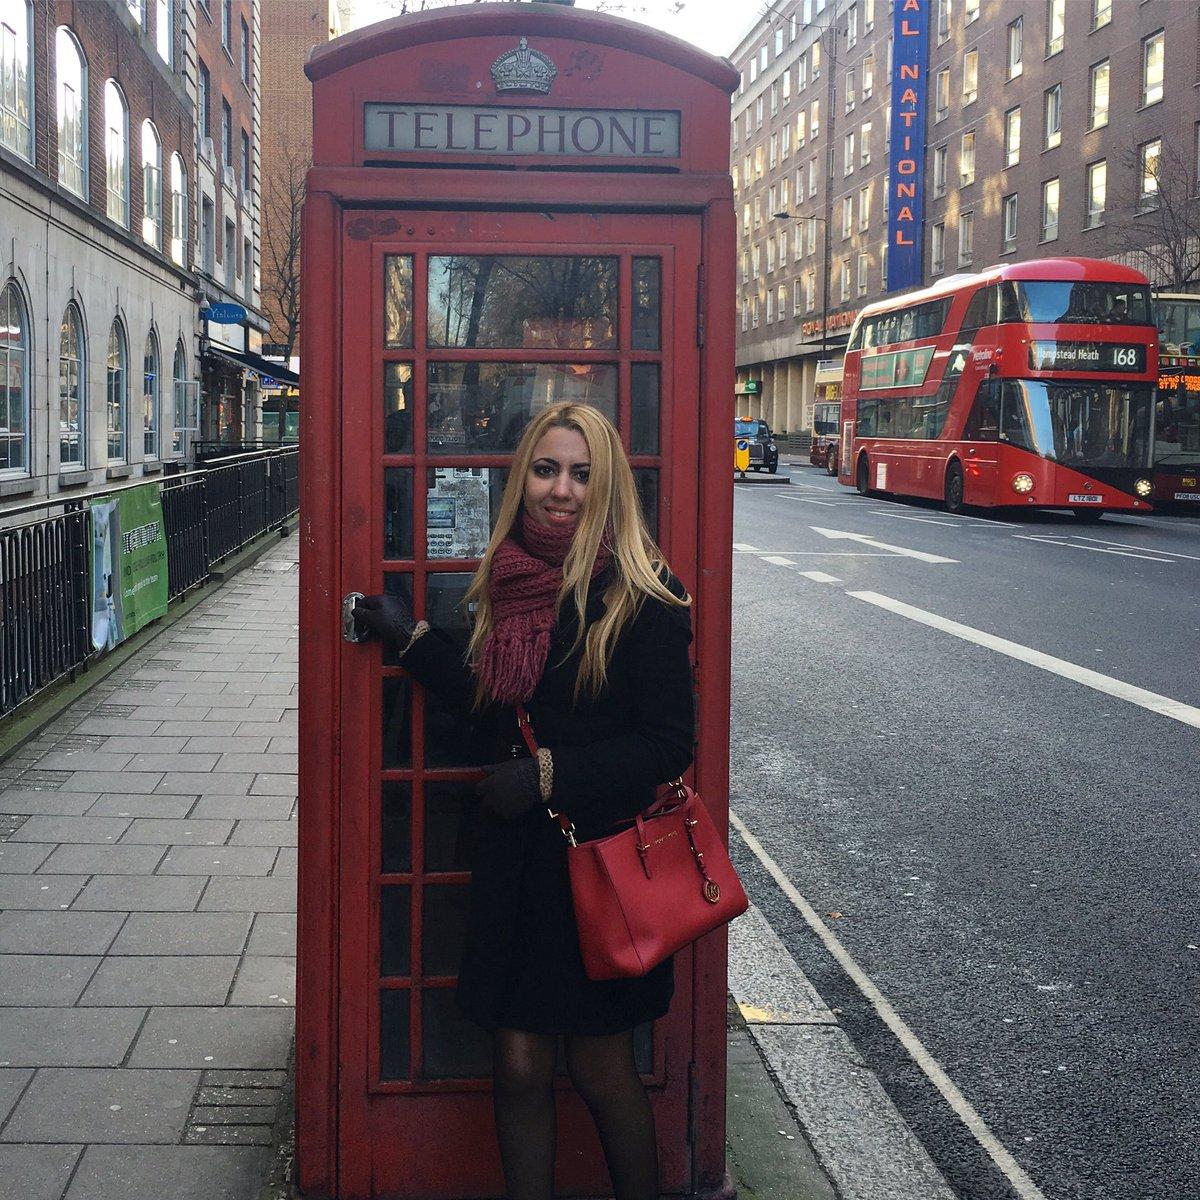 RT @zaida_ward: Típica cabina ☎️📞 #london #uk #travel #greatbritain #england #londres https://t.co/dMEIfgydmD